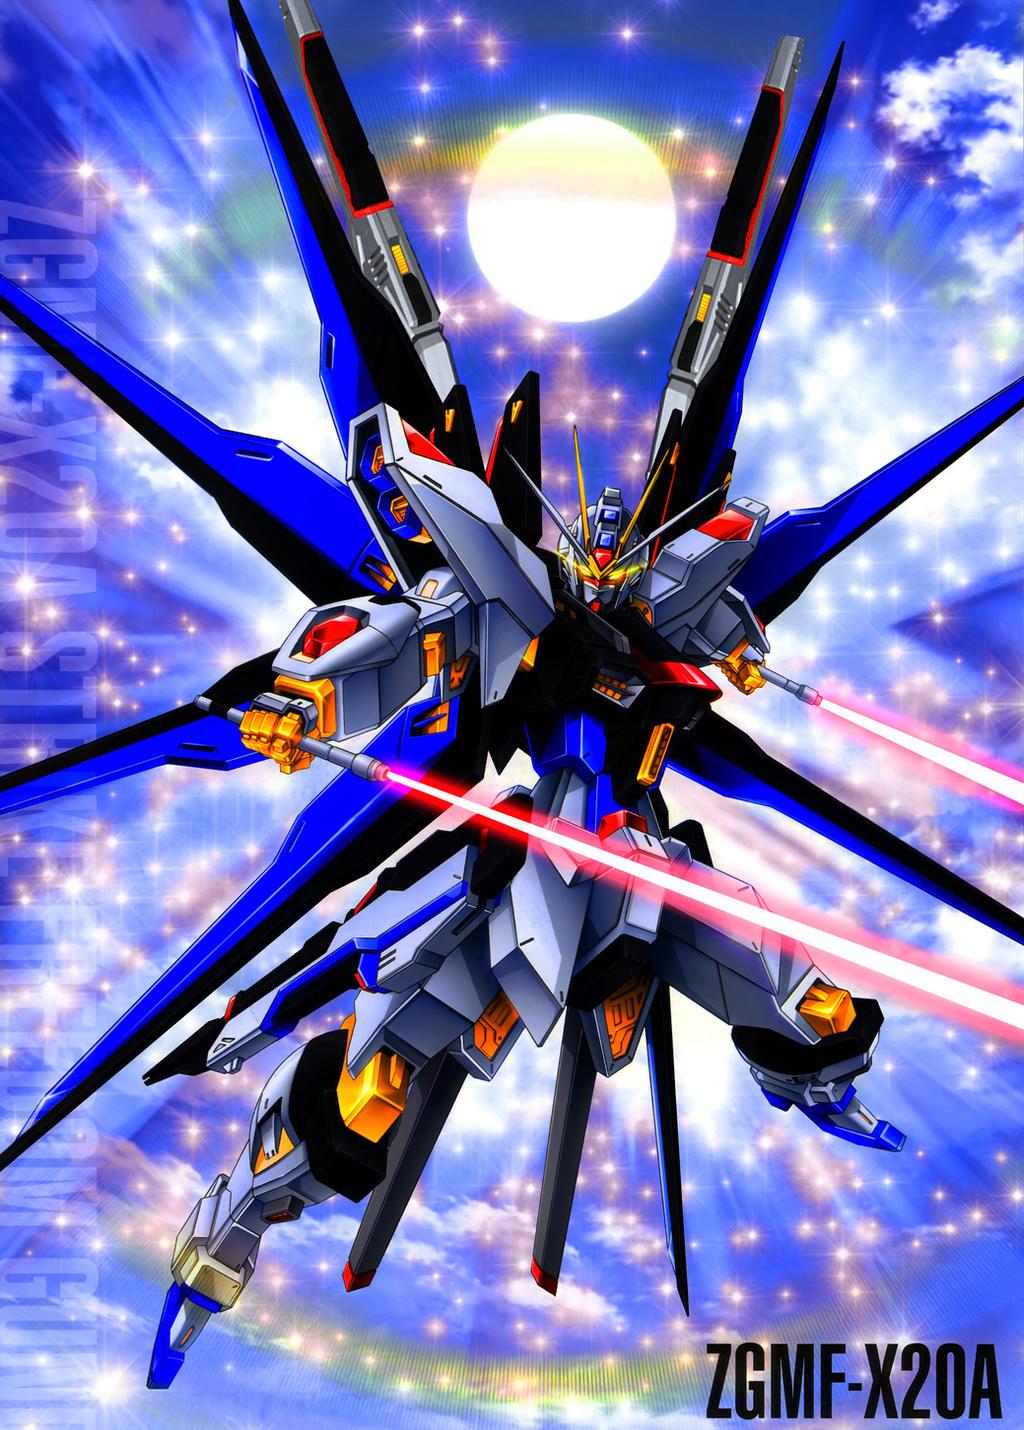 Gundam strike freedom wallpaper hd